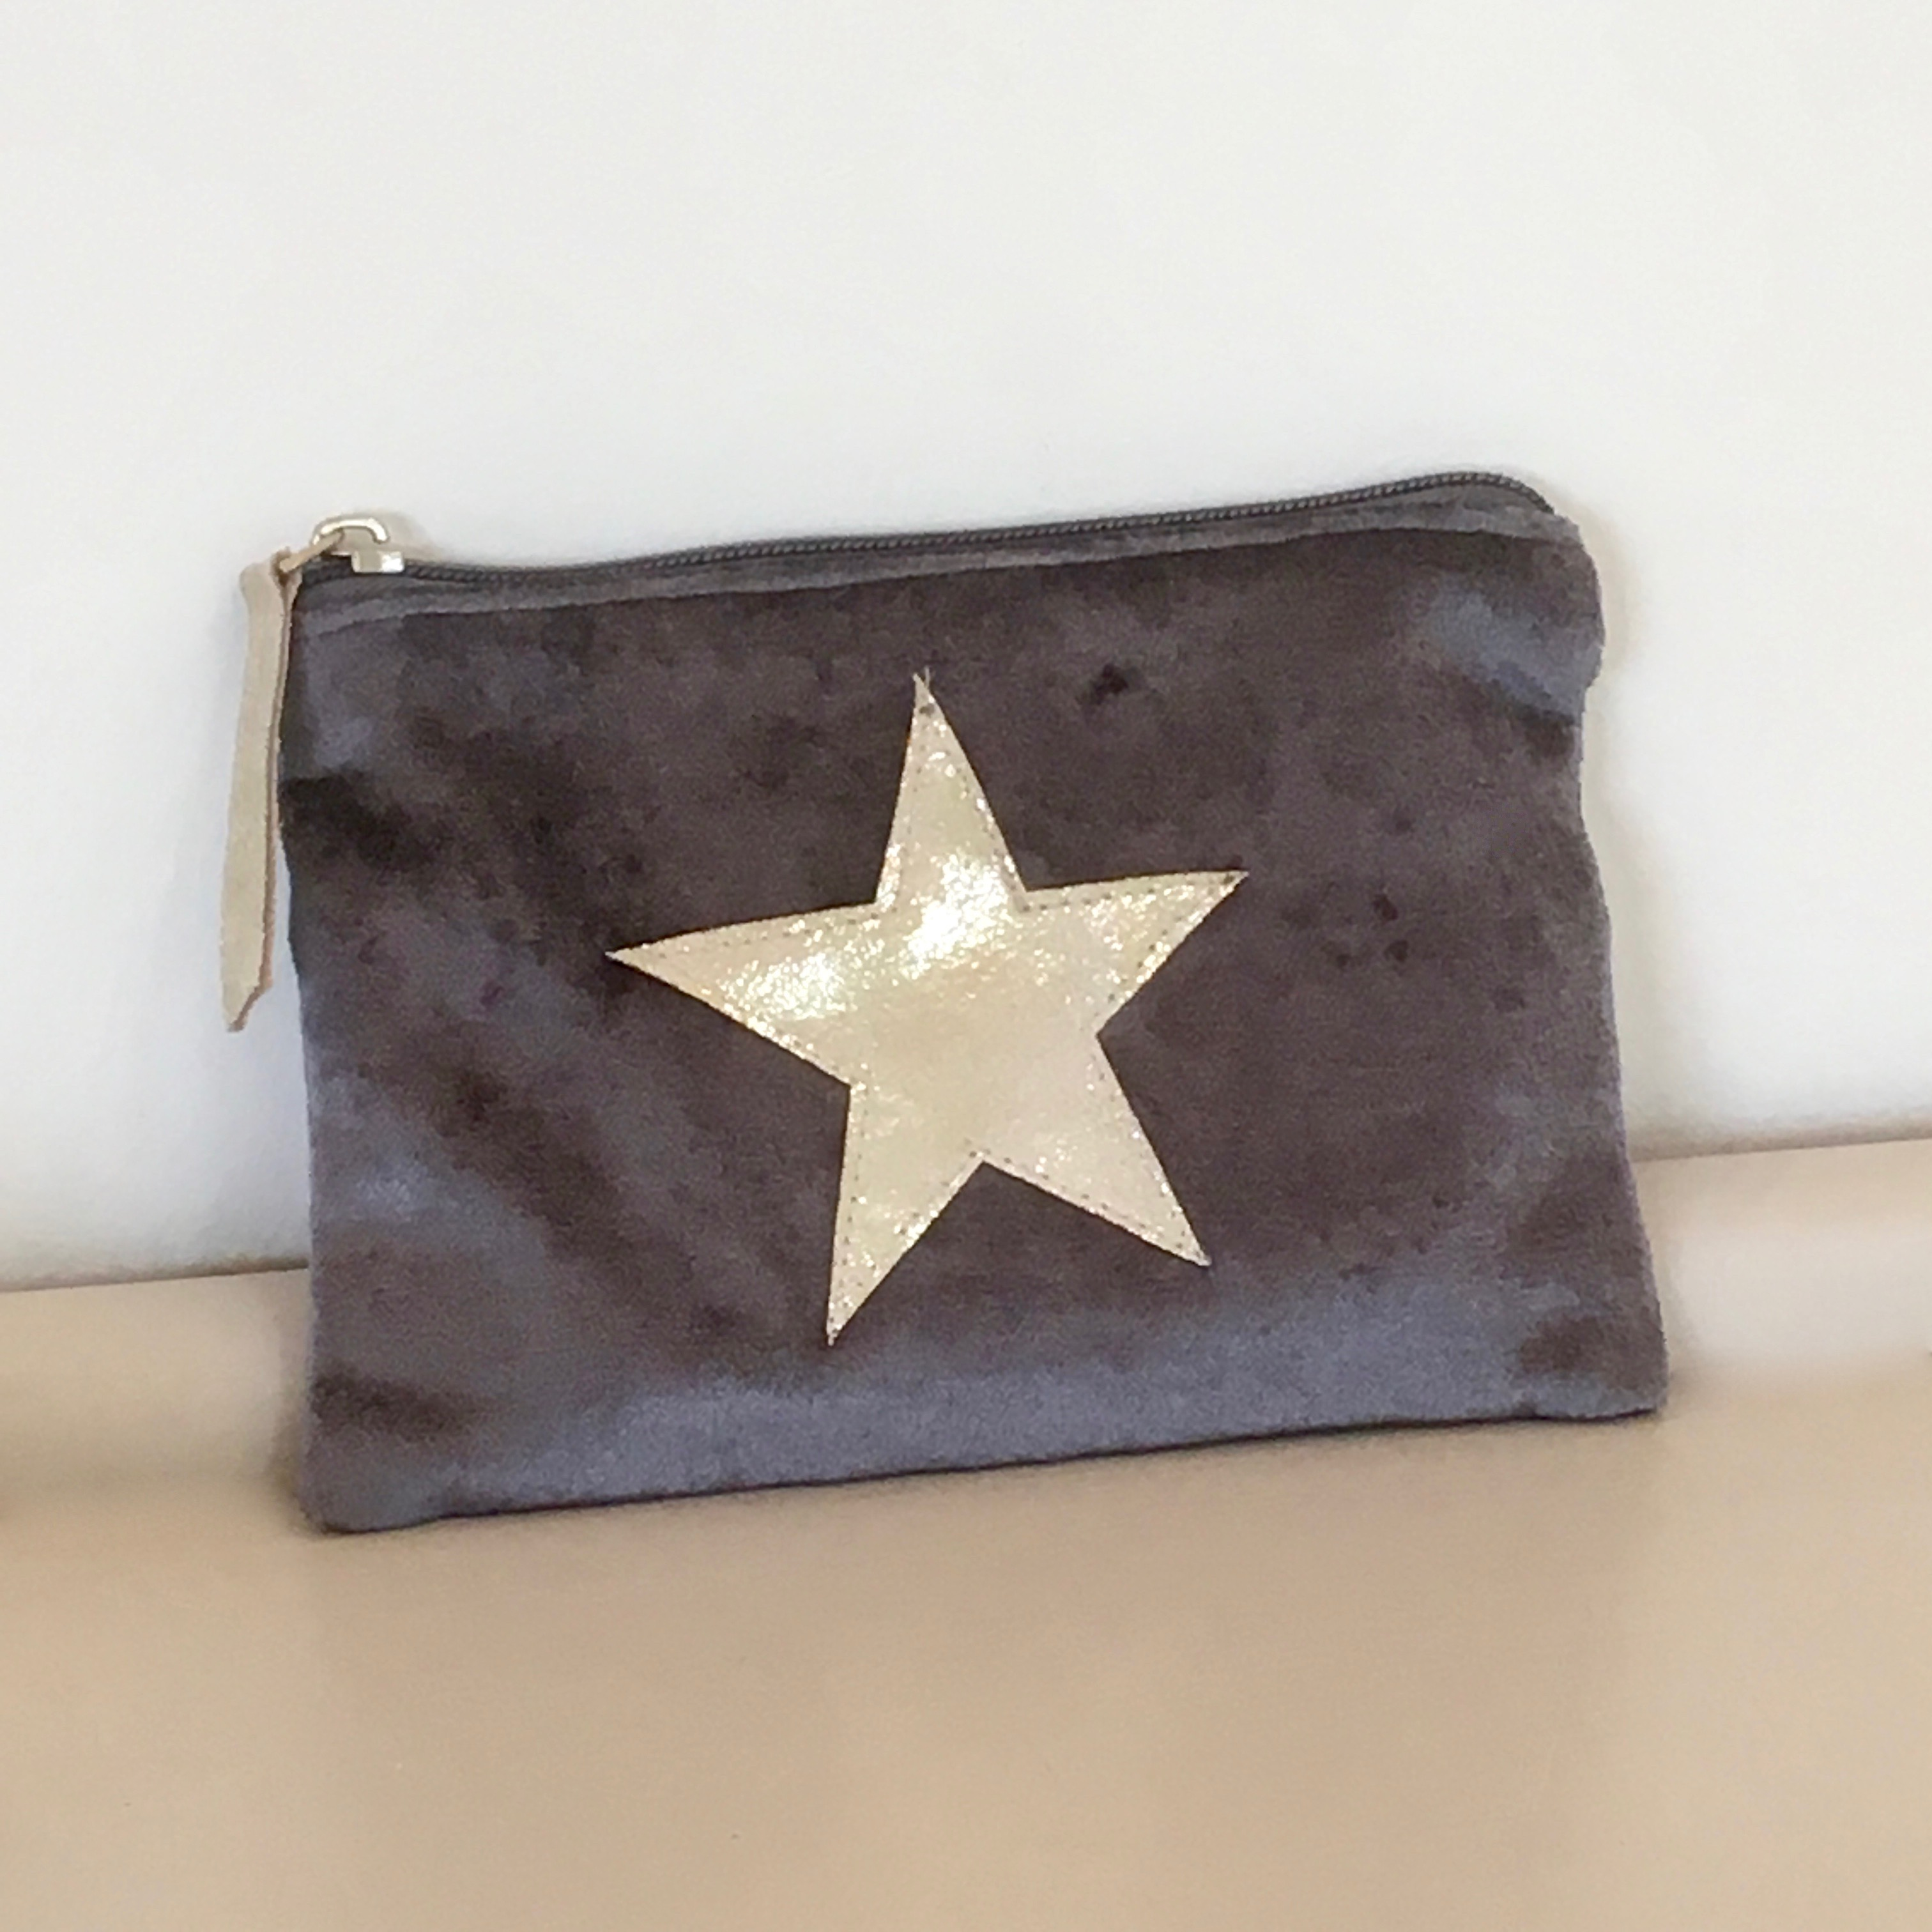 Warm Grey & Gold Star Make up Bag